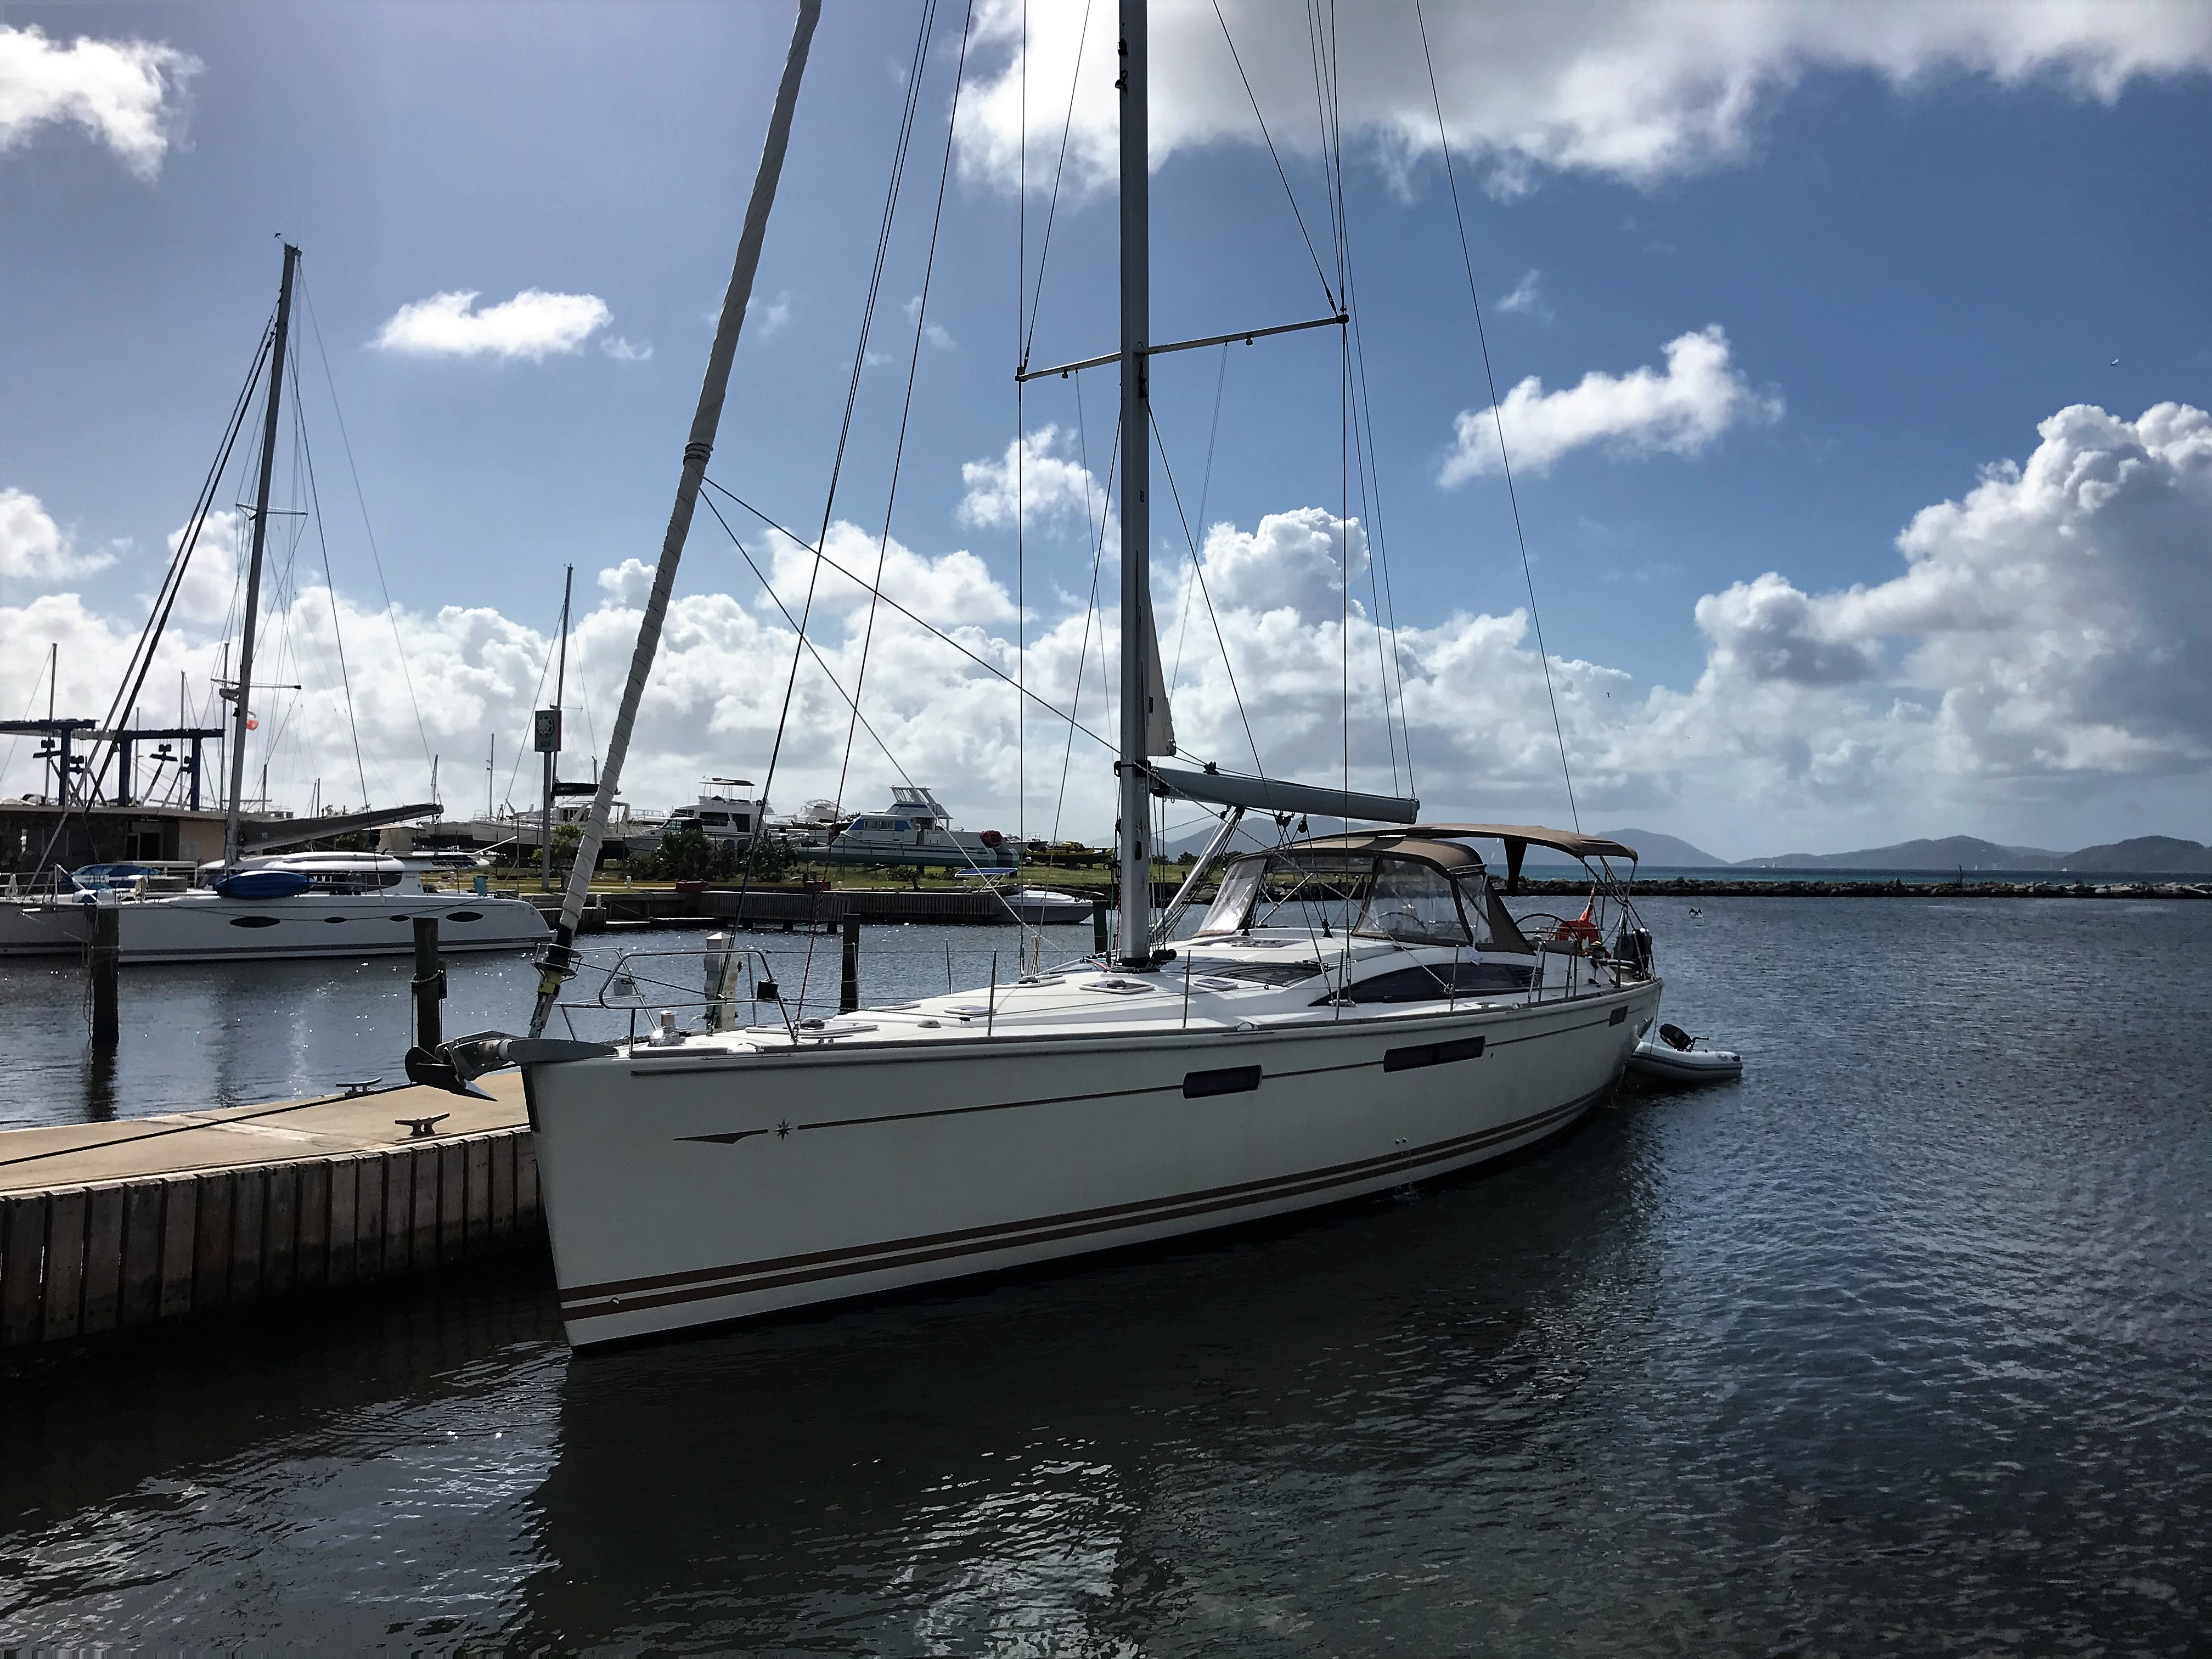 Jeanneau 57 Port Hull Side